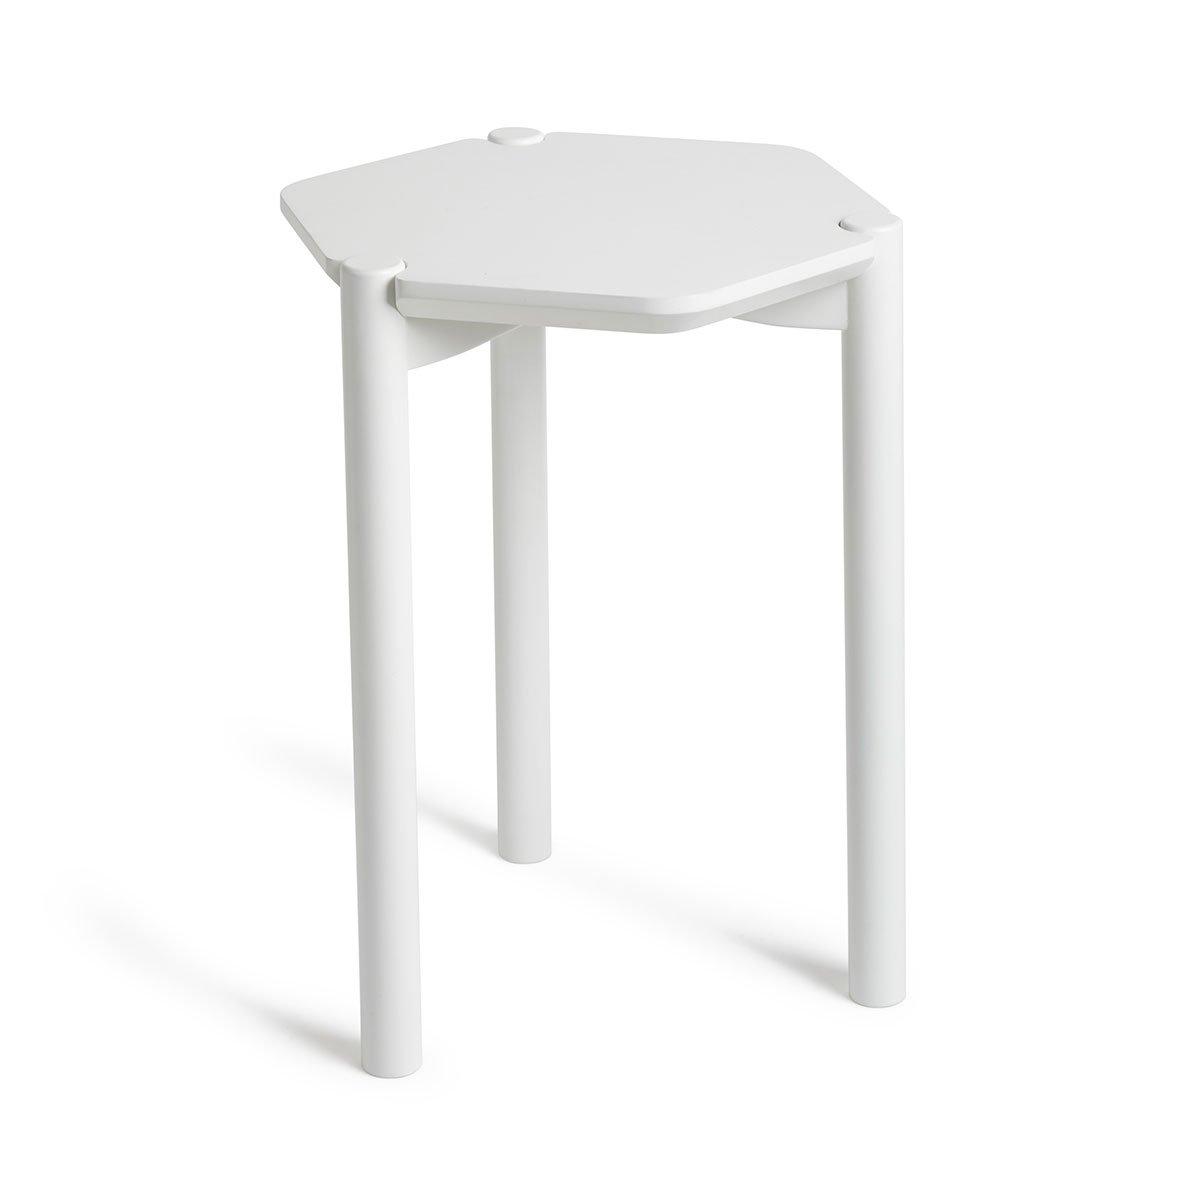 umbra HEXA SIDE TABLE(ヘクサ サイドテーブル) ホワイト 2320310660 B01ANF5ST4 ホワイト ホワイト